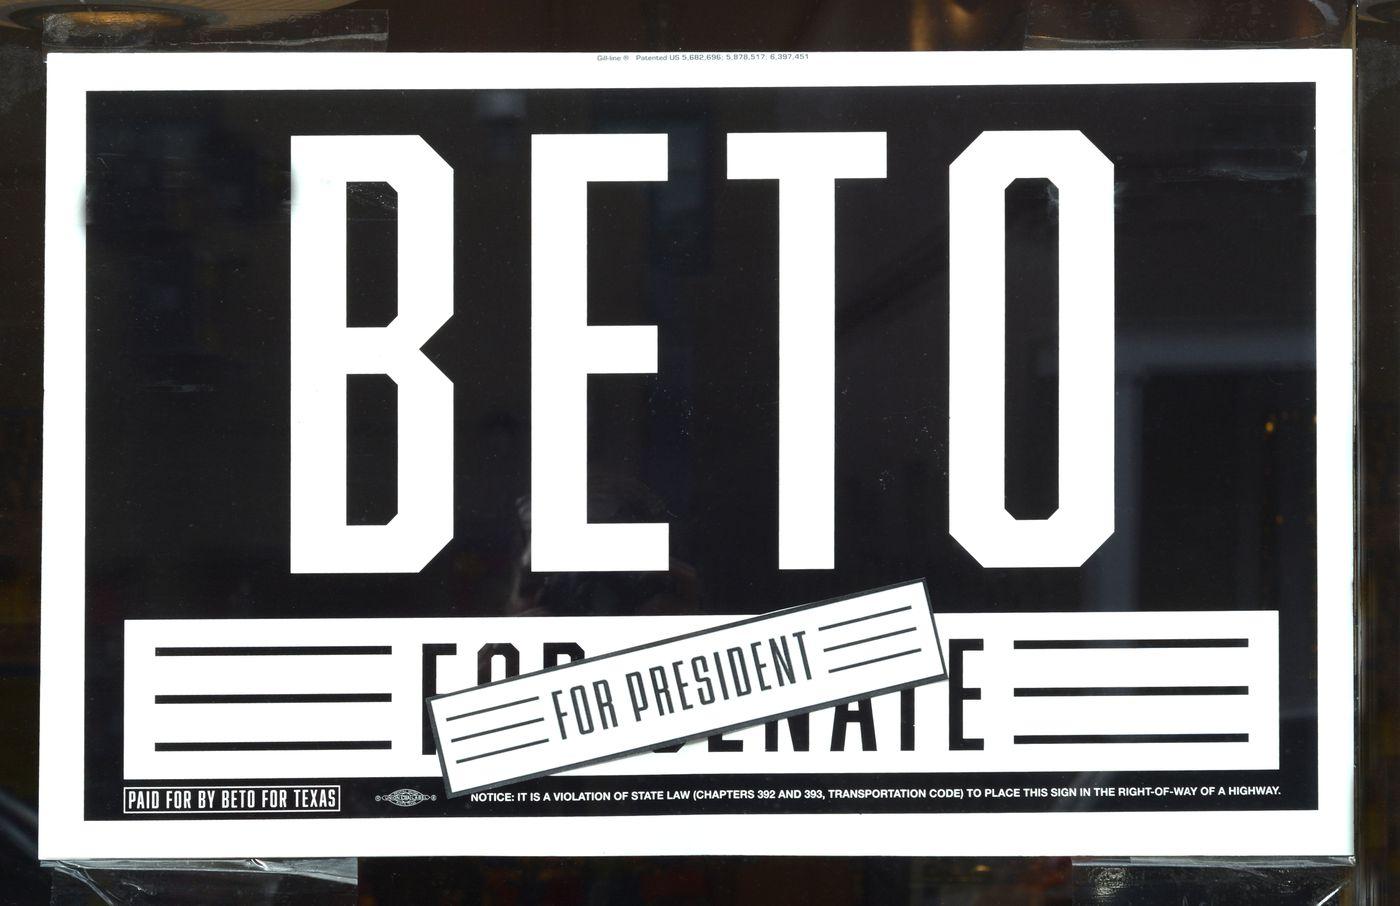 the 2020 democratic presidential